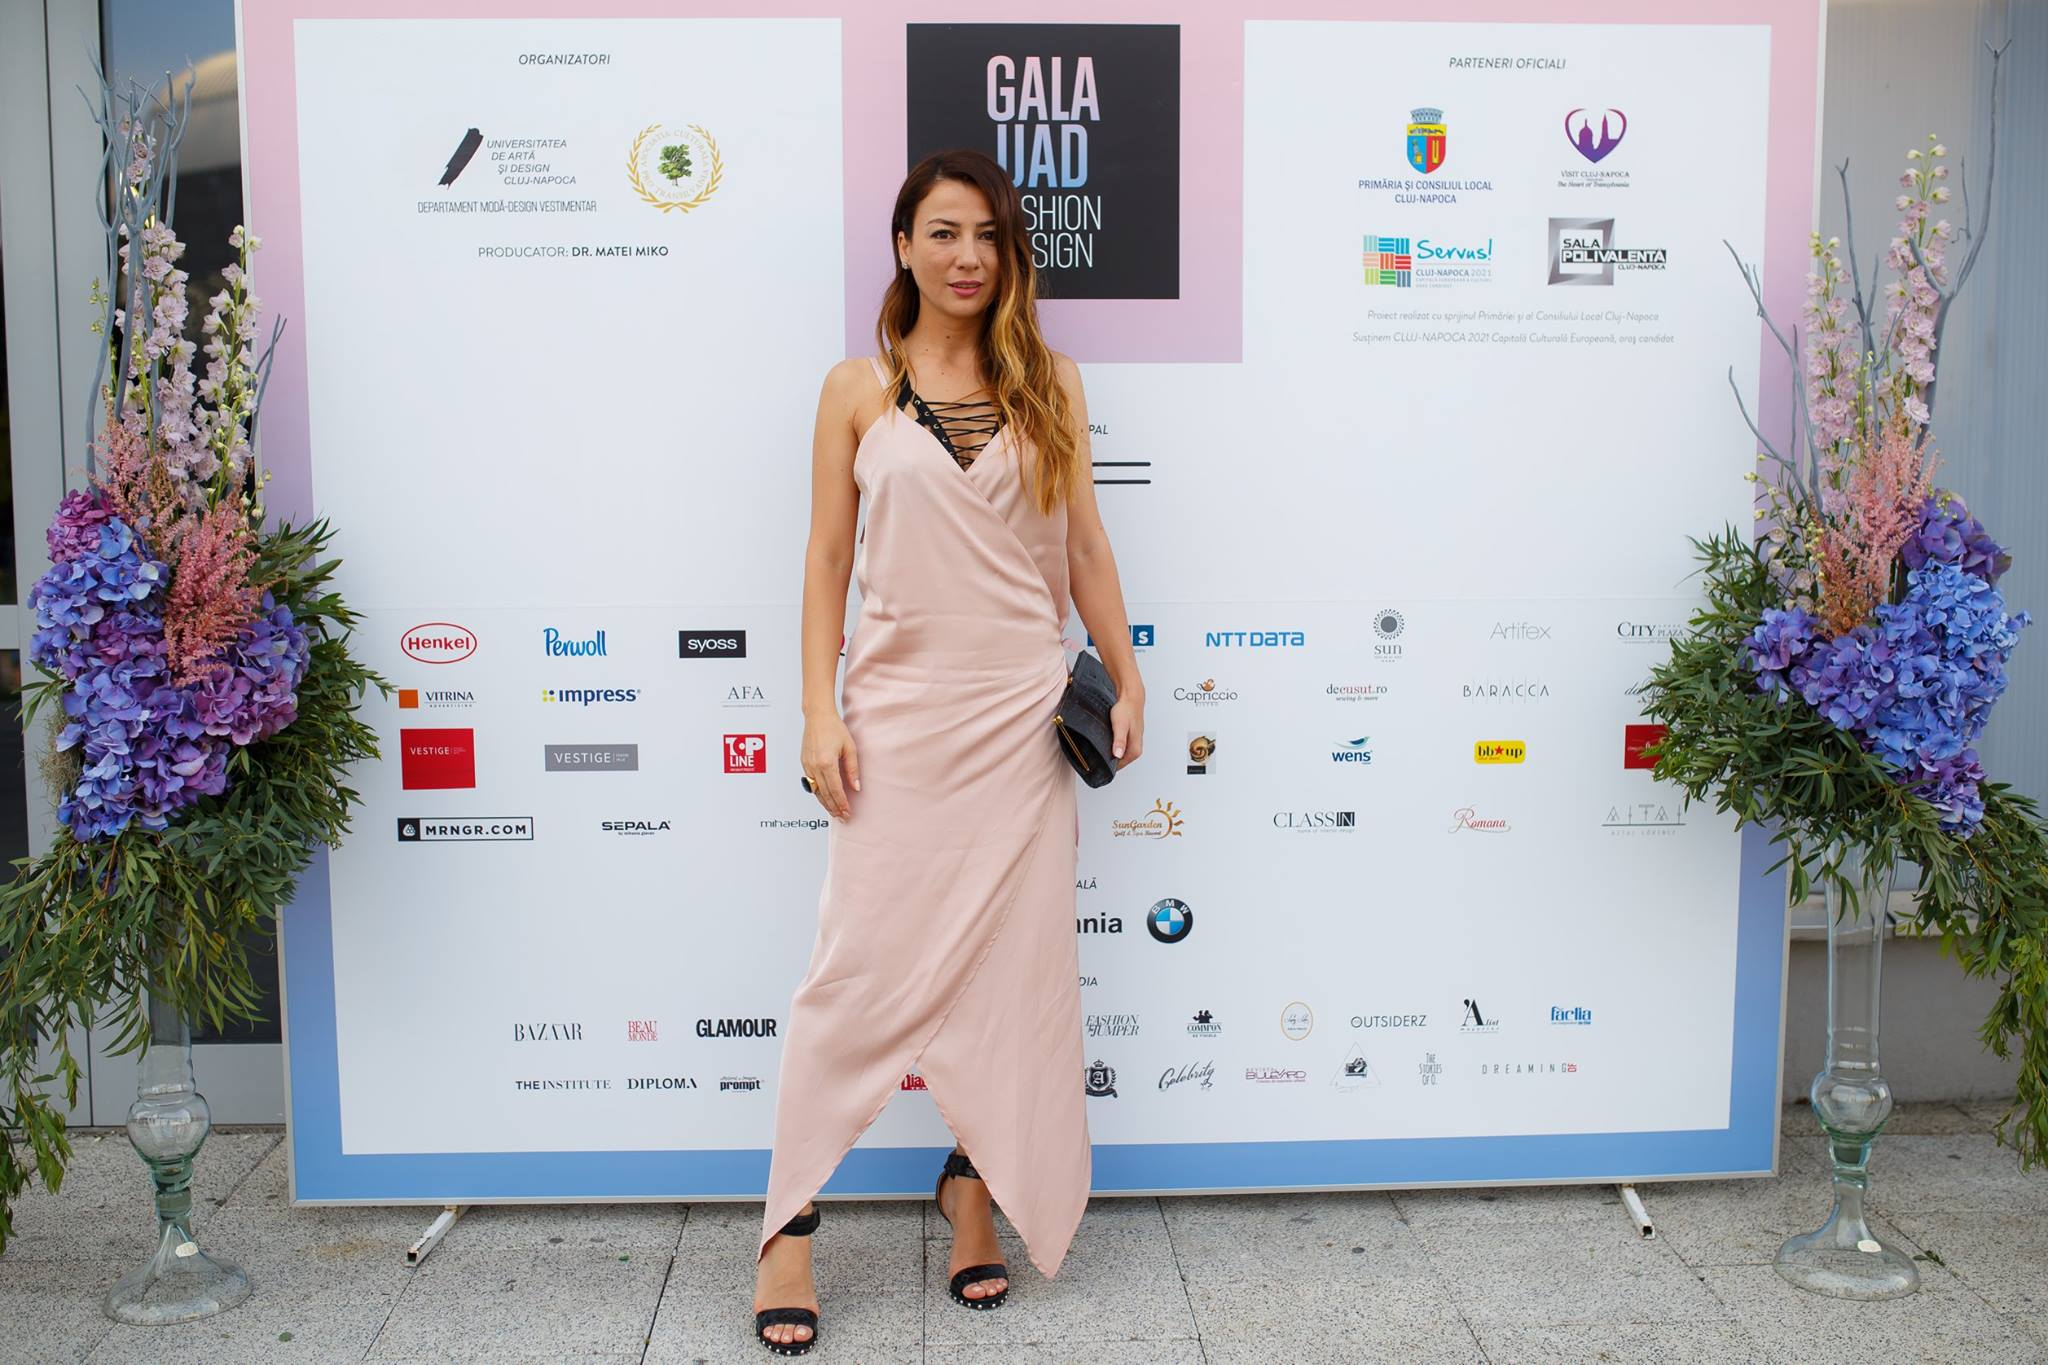 Mirela Bucovicean Gala UAD